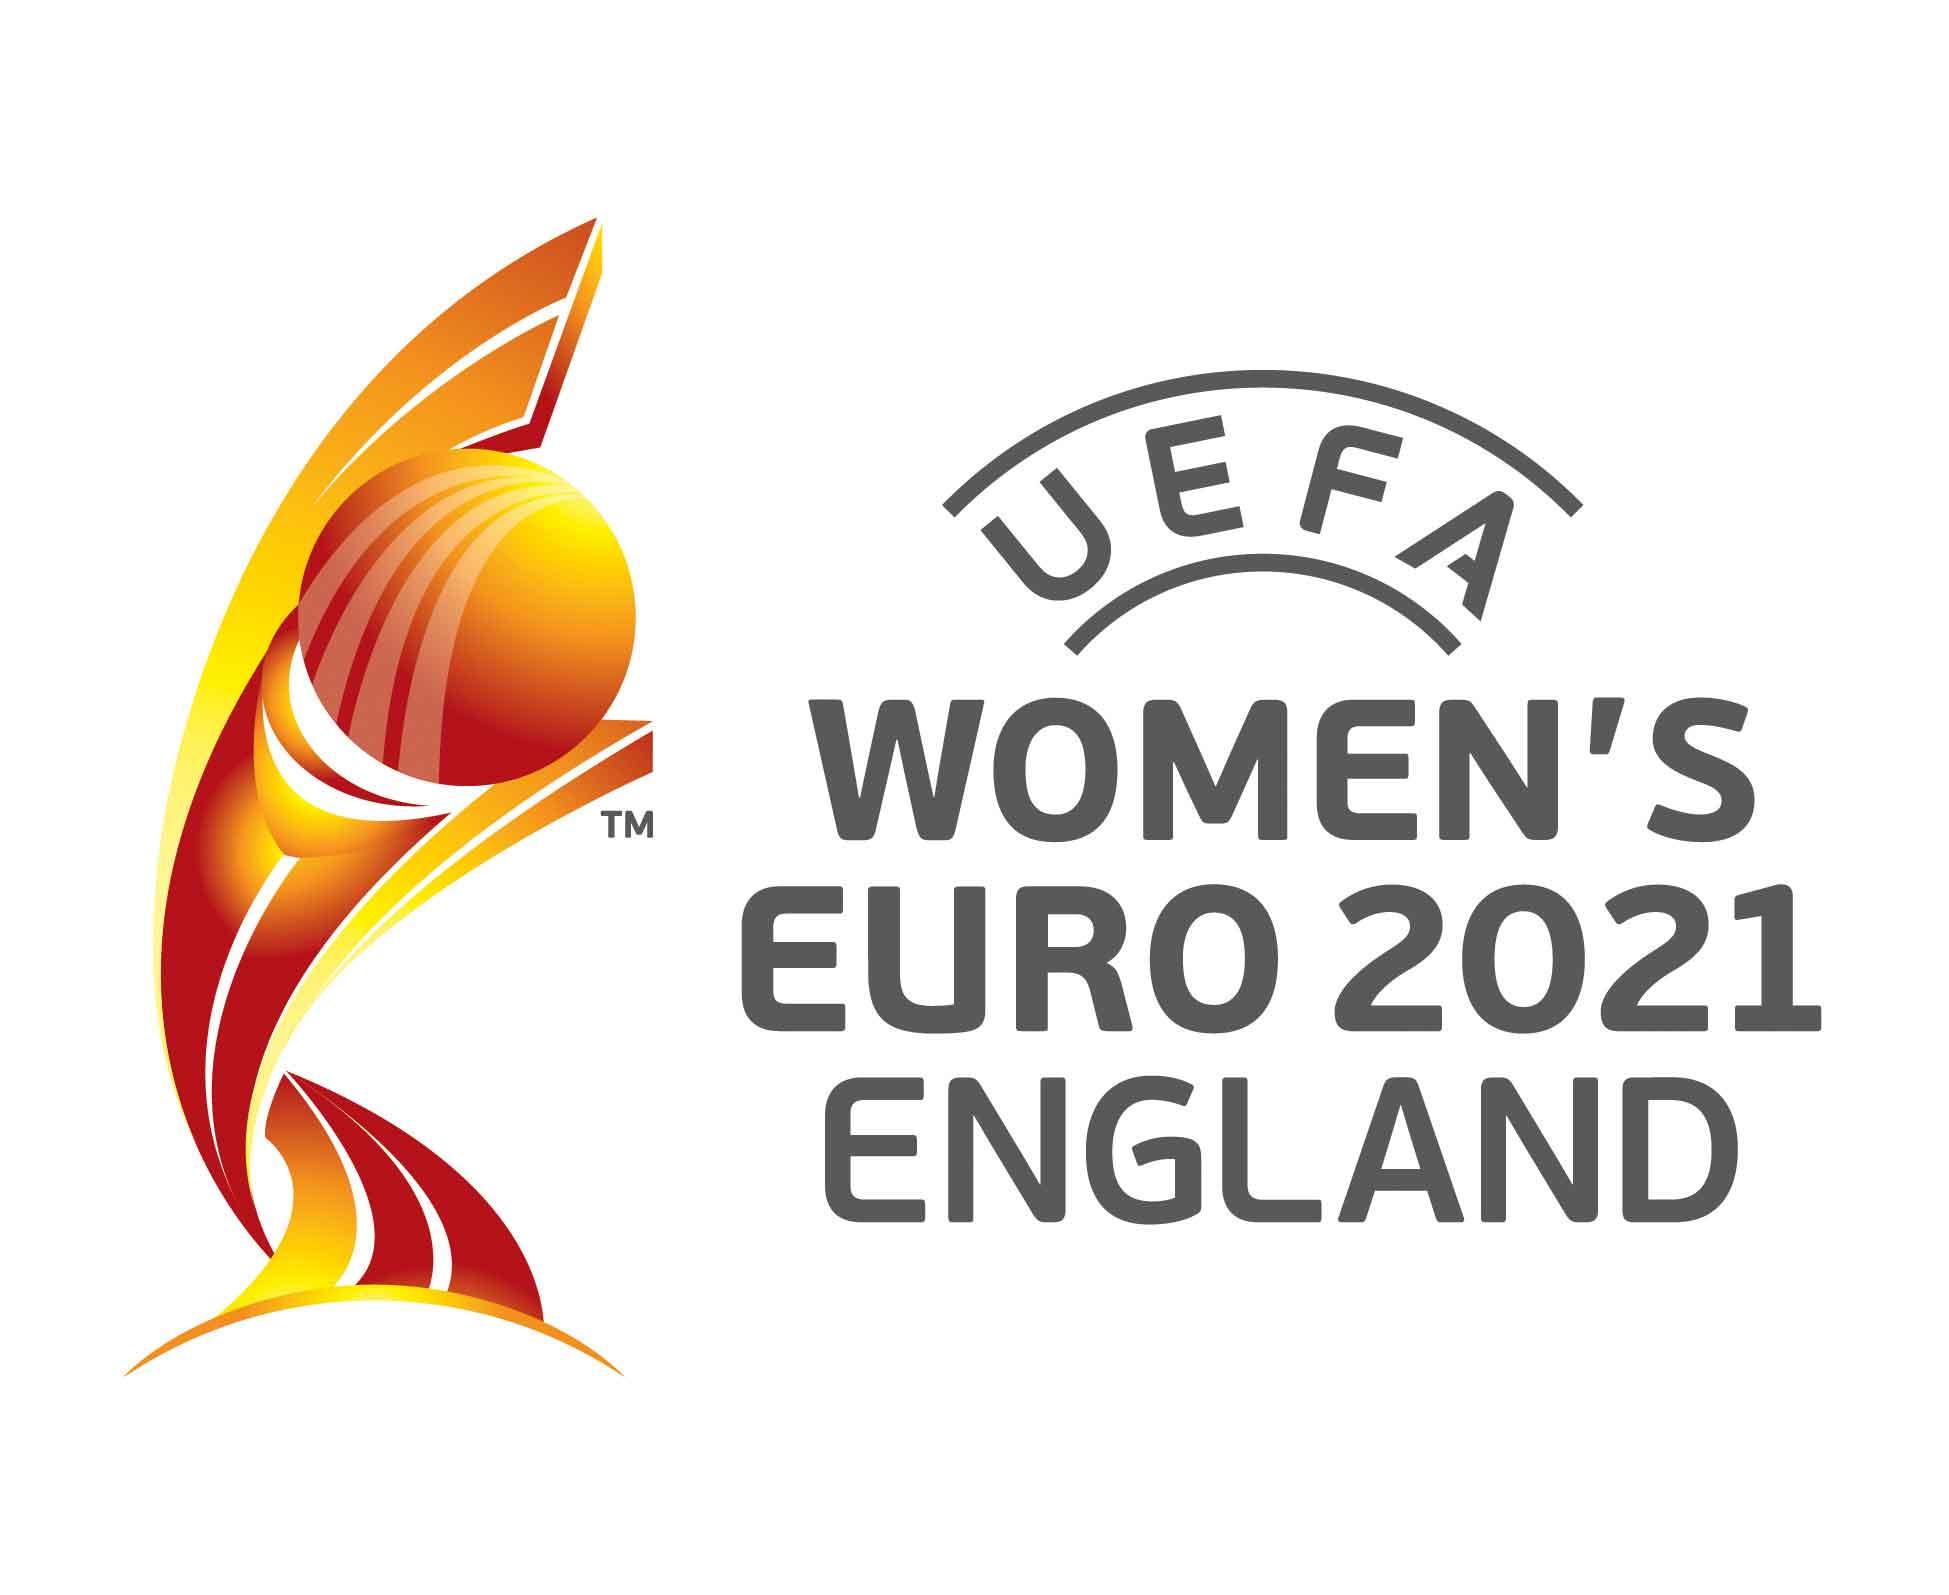 TV - Le duo TF1 - Canal + pour diffuser l'Euro 2021